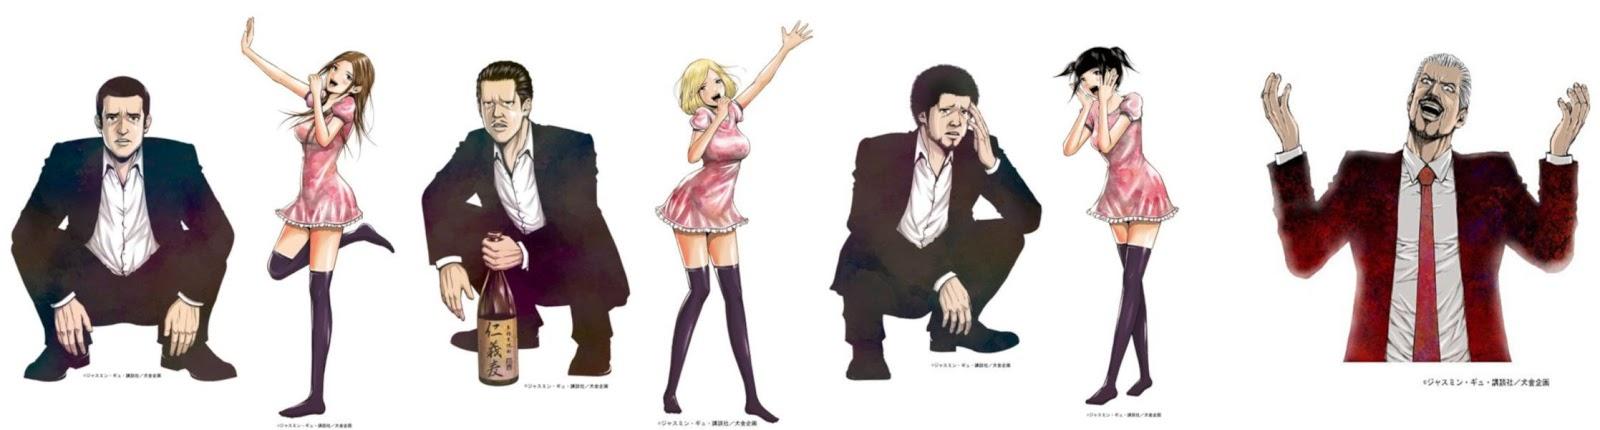 Back Street Girls anime personajes